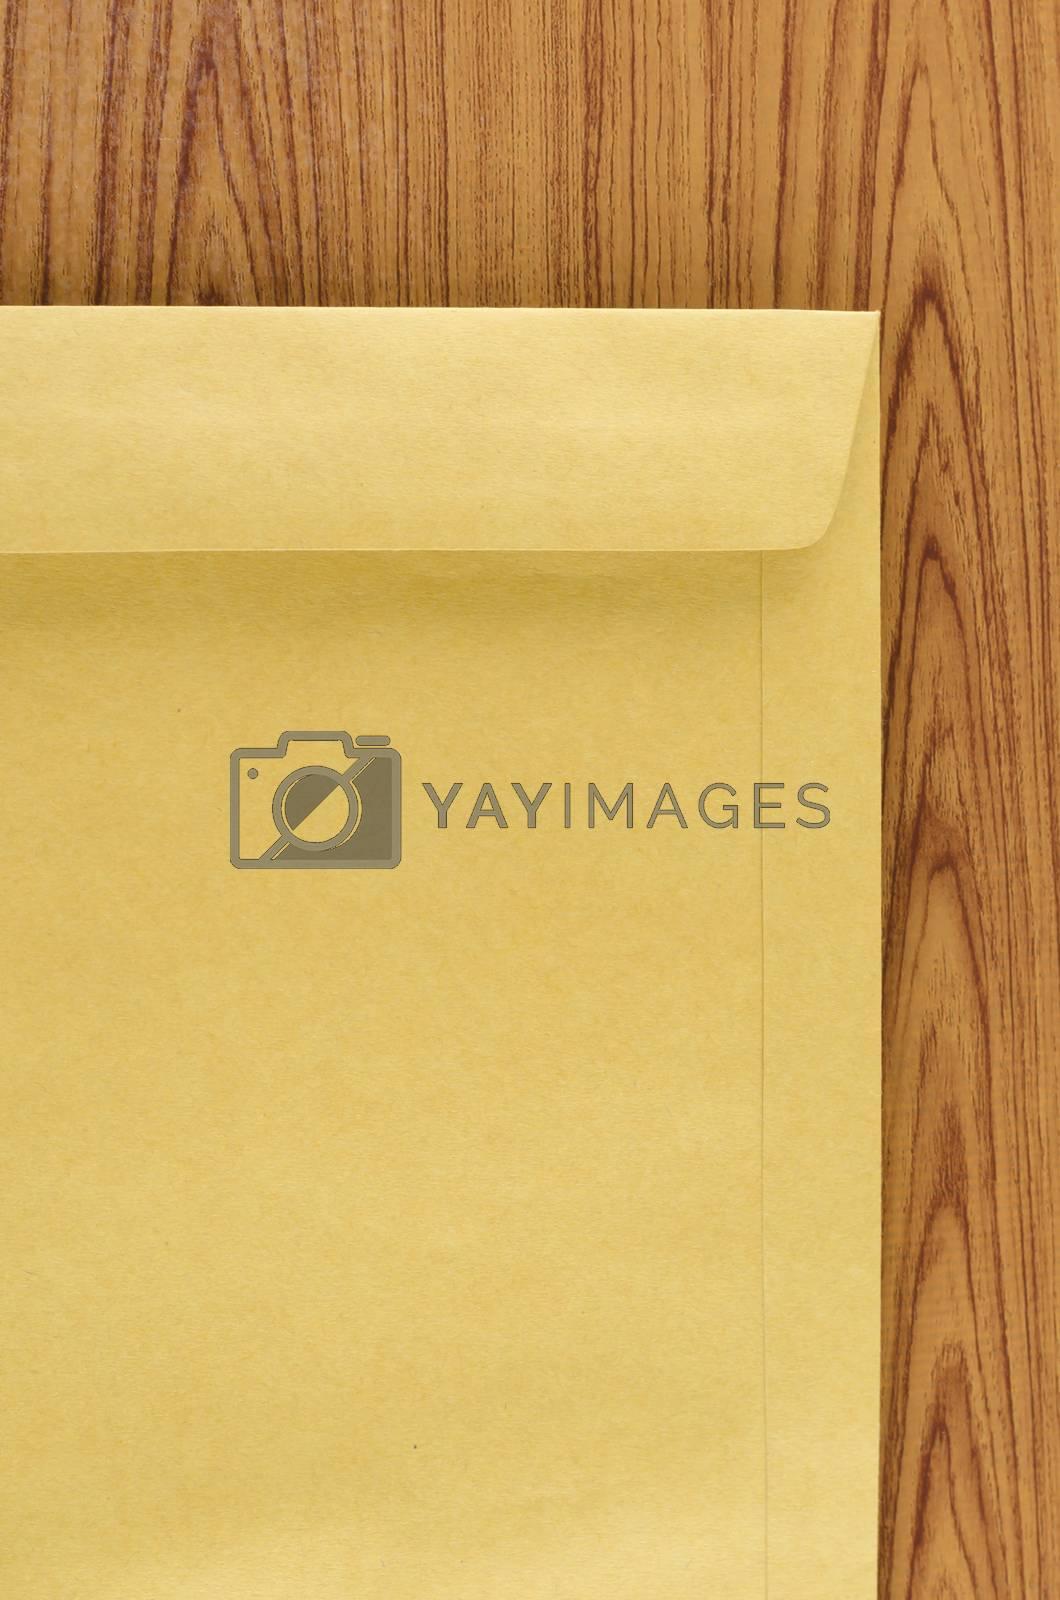 Royalty free image of brown envelope by ammza12